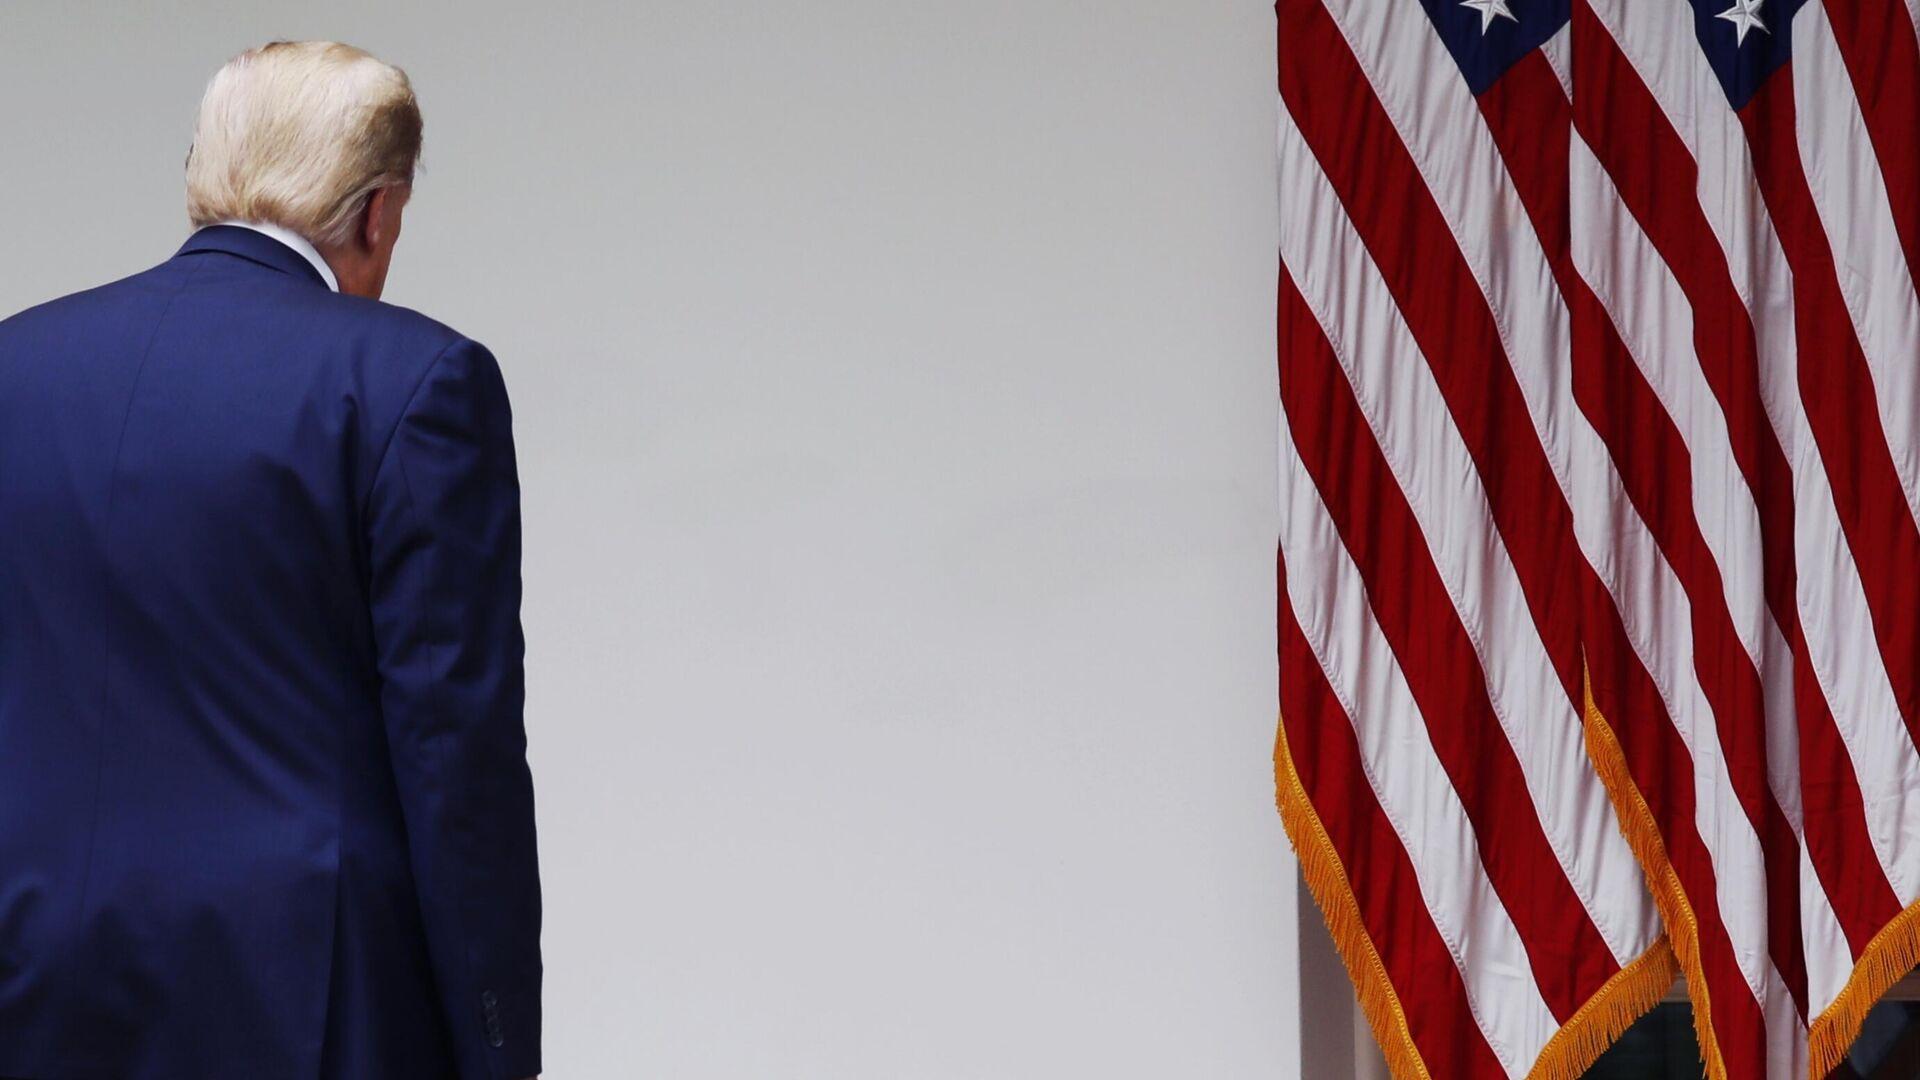 Президент США Дональд Трамп после окончания брифинга в Розовом саду Белого дома - РИА Новости, 1920, 19.06.2020